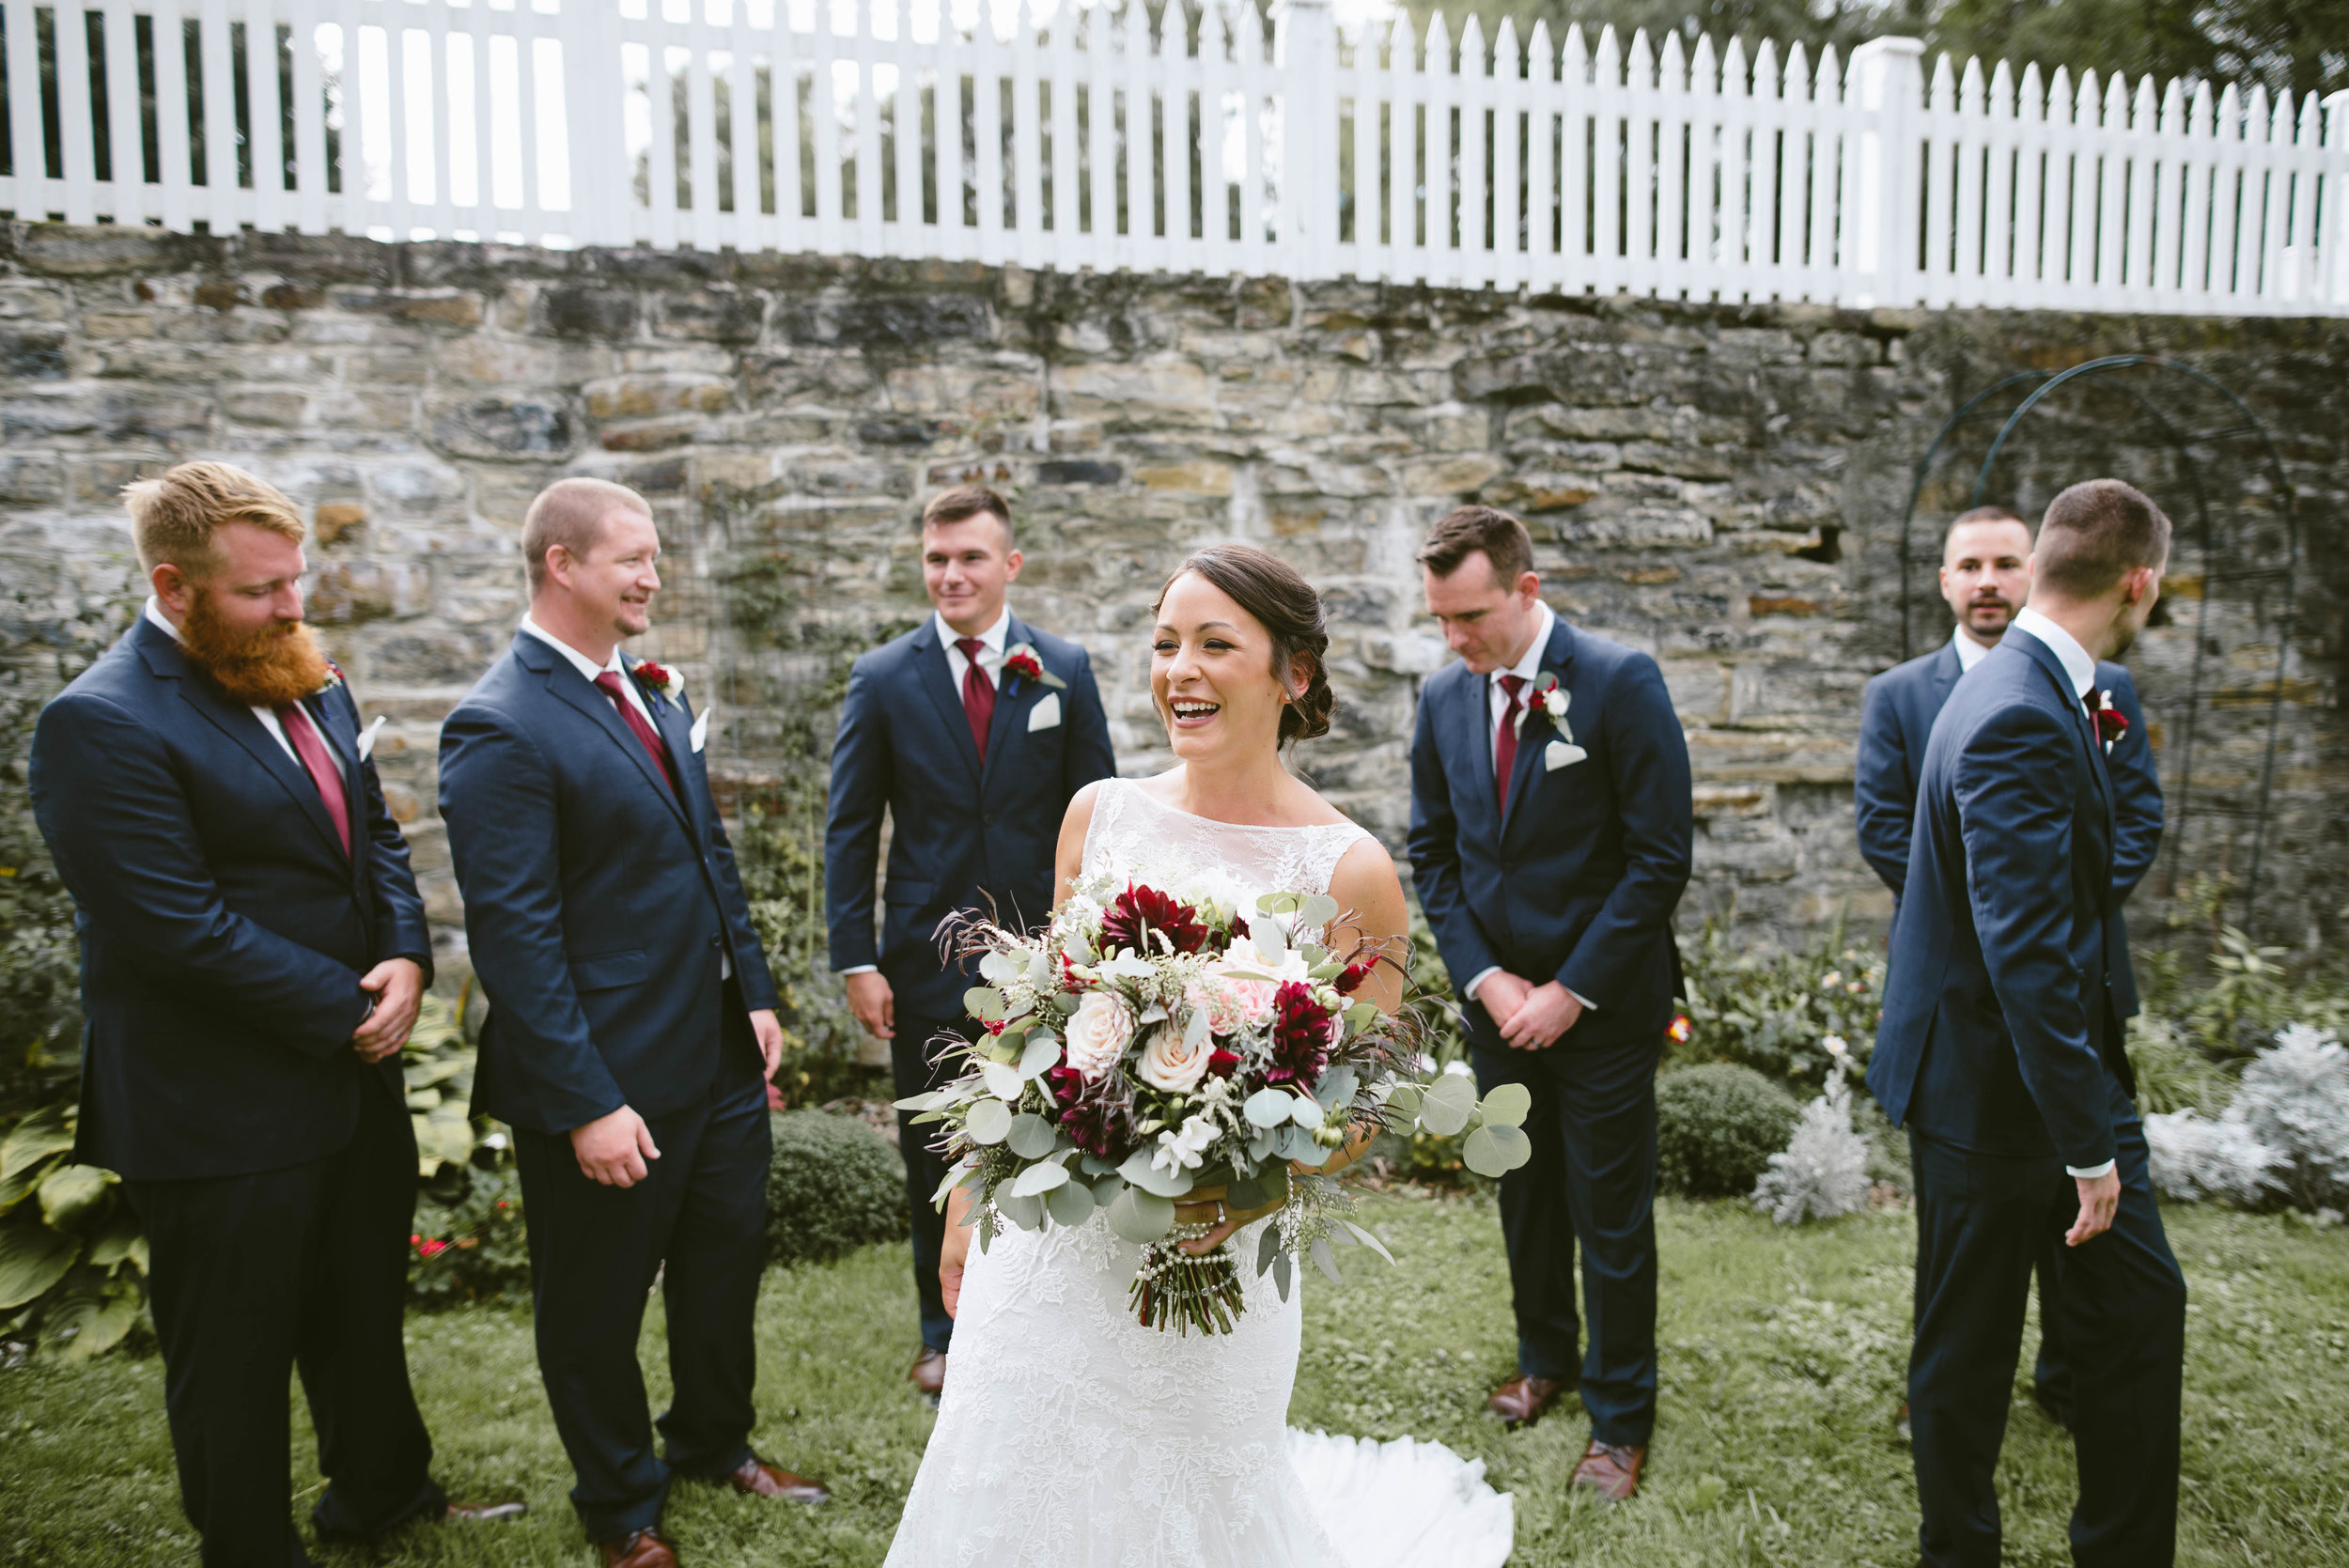 west overton barn wedding-40.jpg